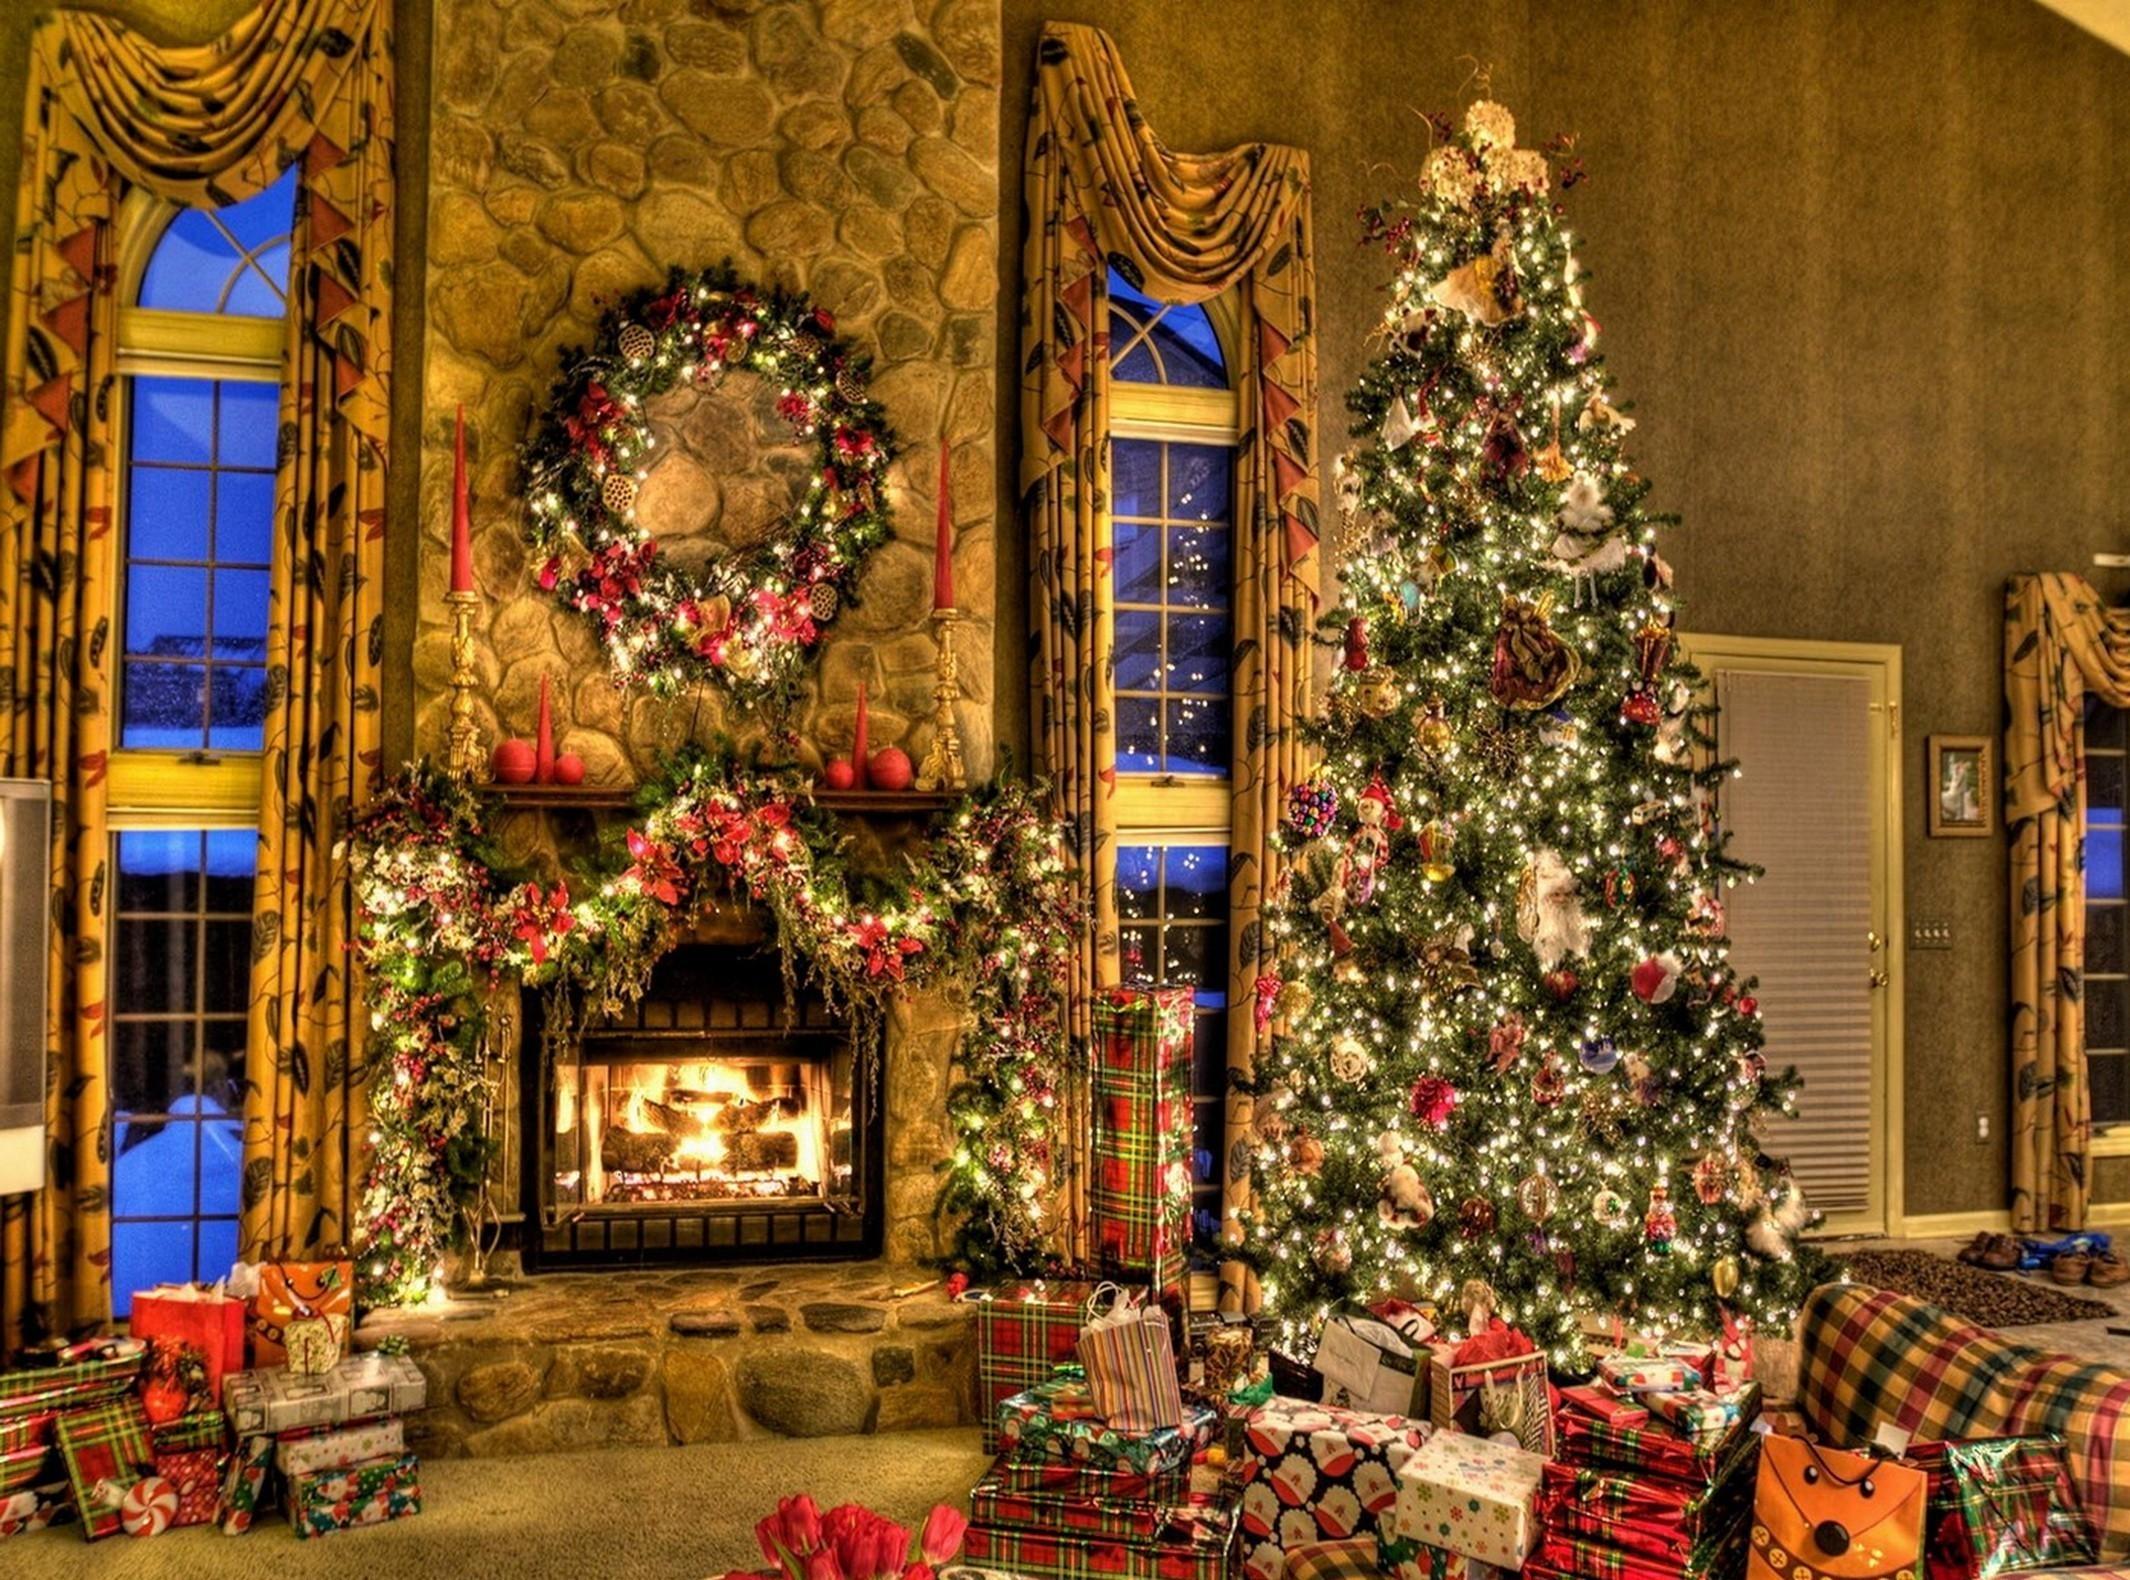 73 Free Christmas Fireplace Wallpaper On Wallpapersafari